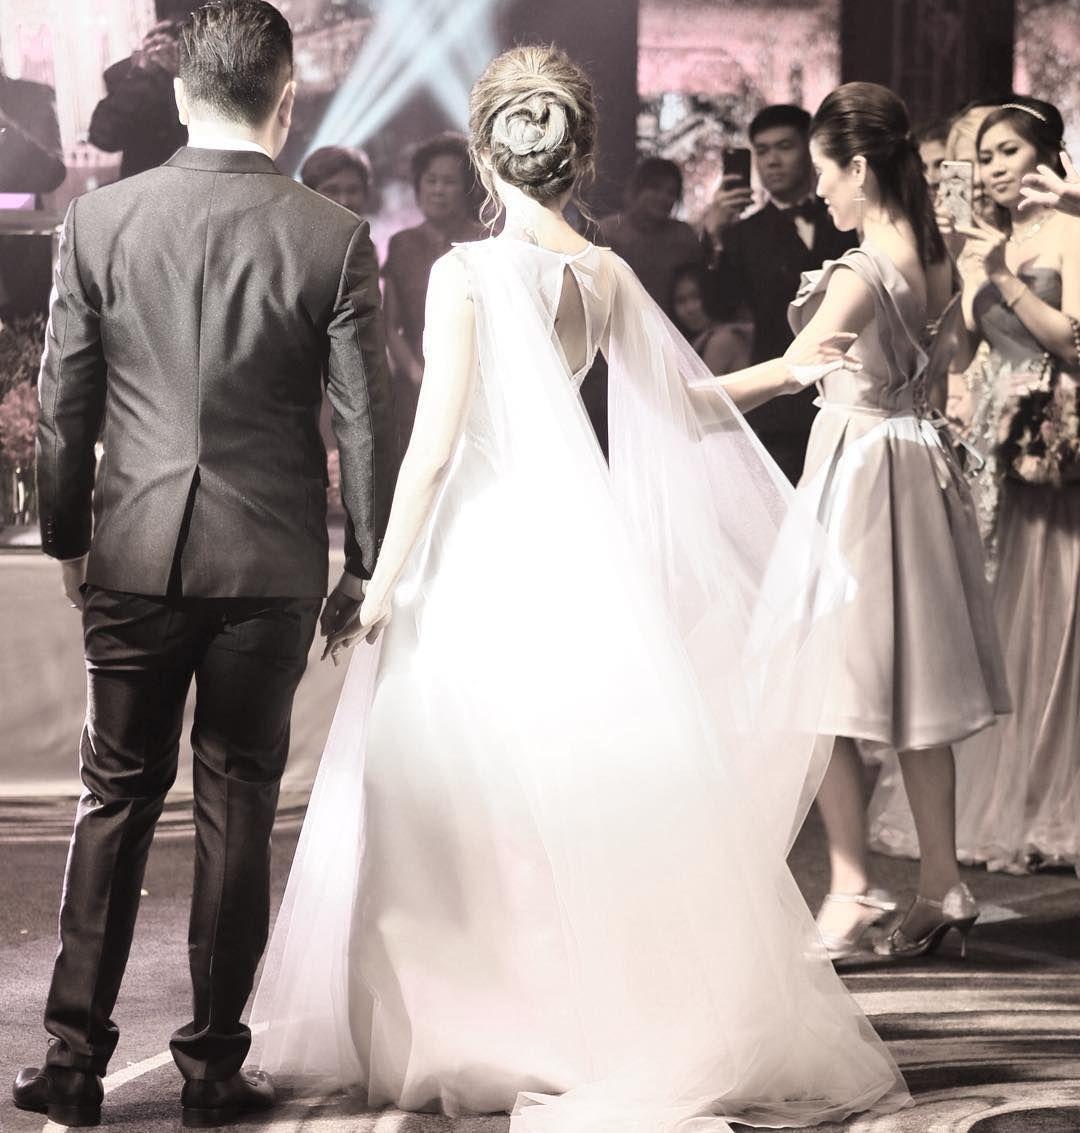 Custom made wedding dress  Congratulations to KhunMayKhunPok Khun May maynie looks stunning